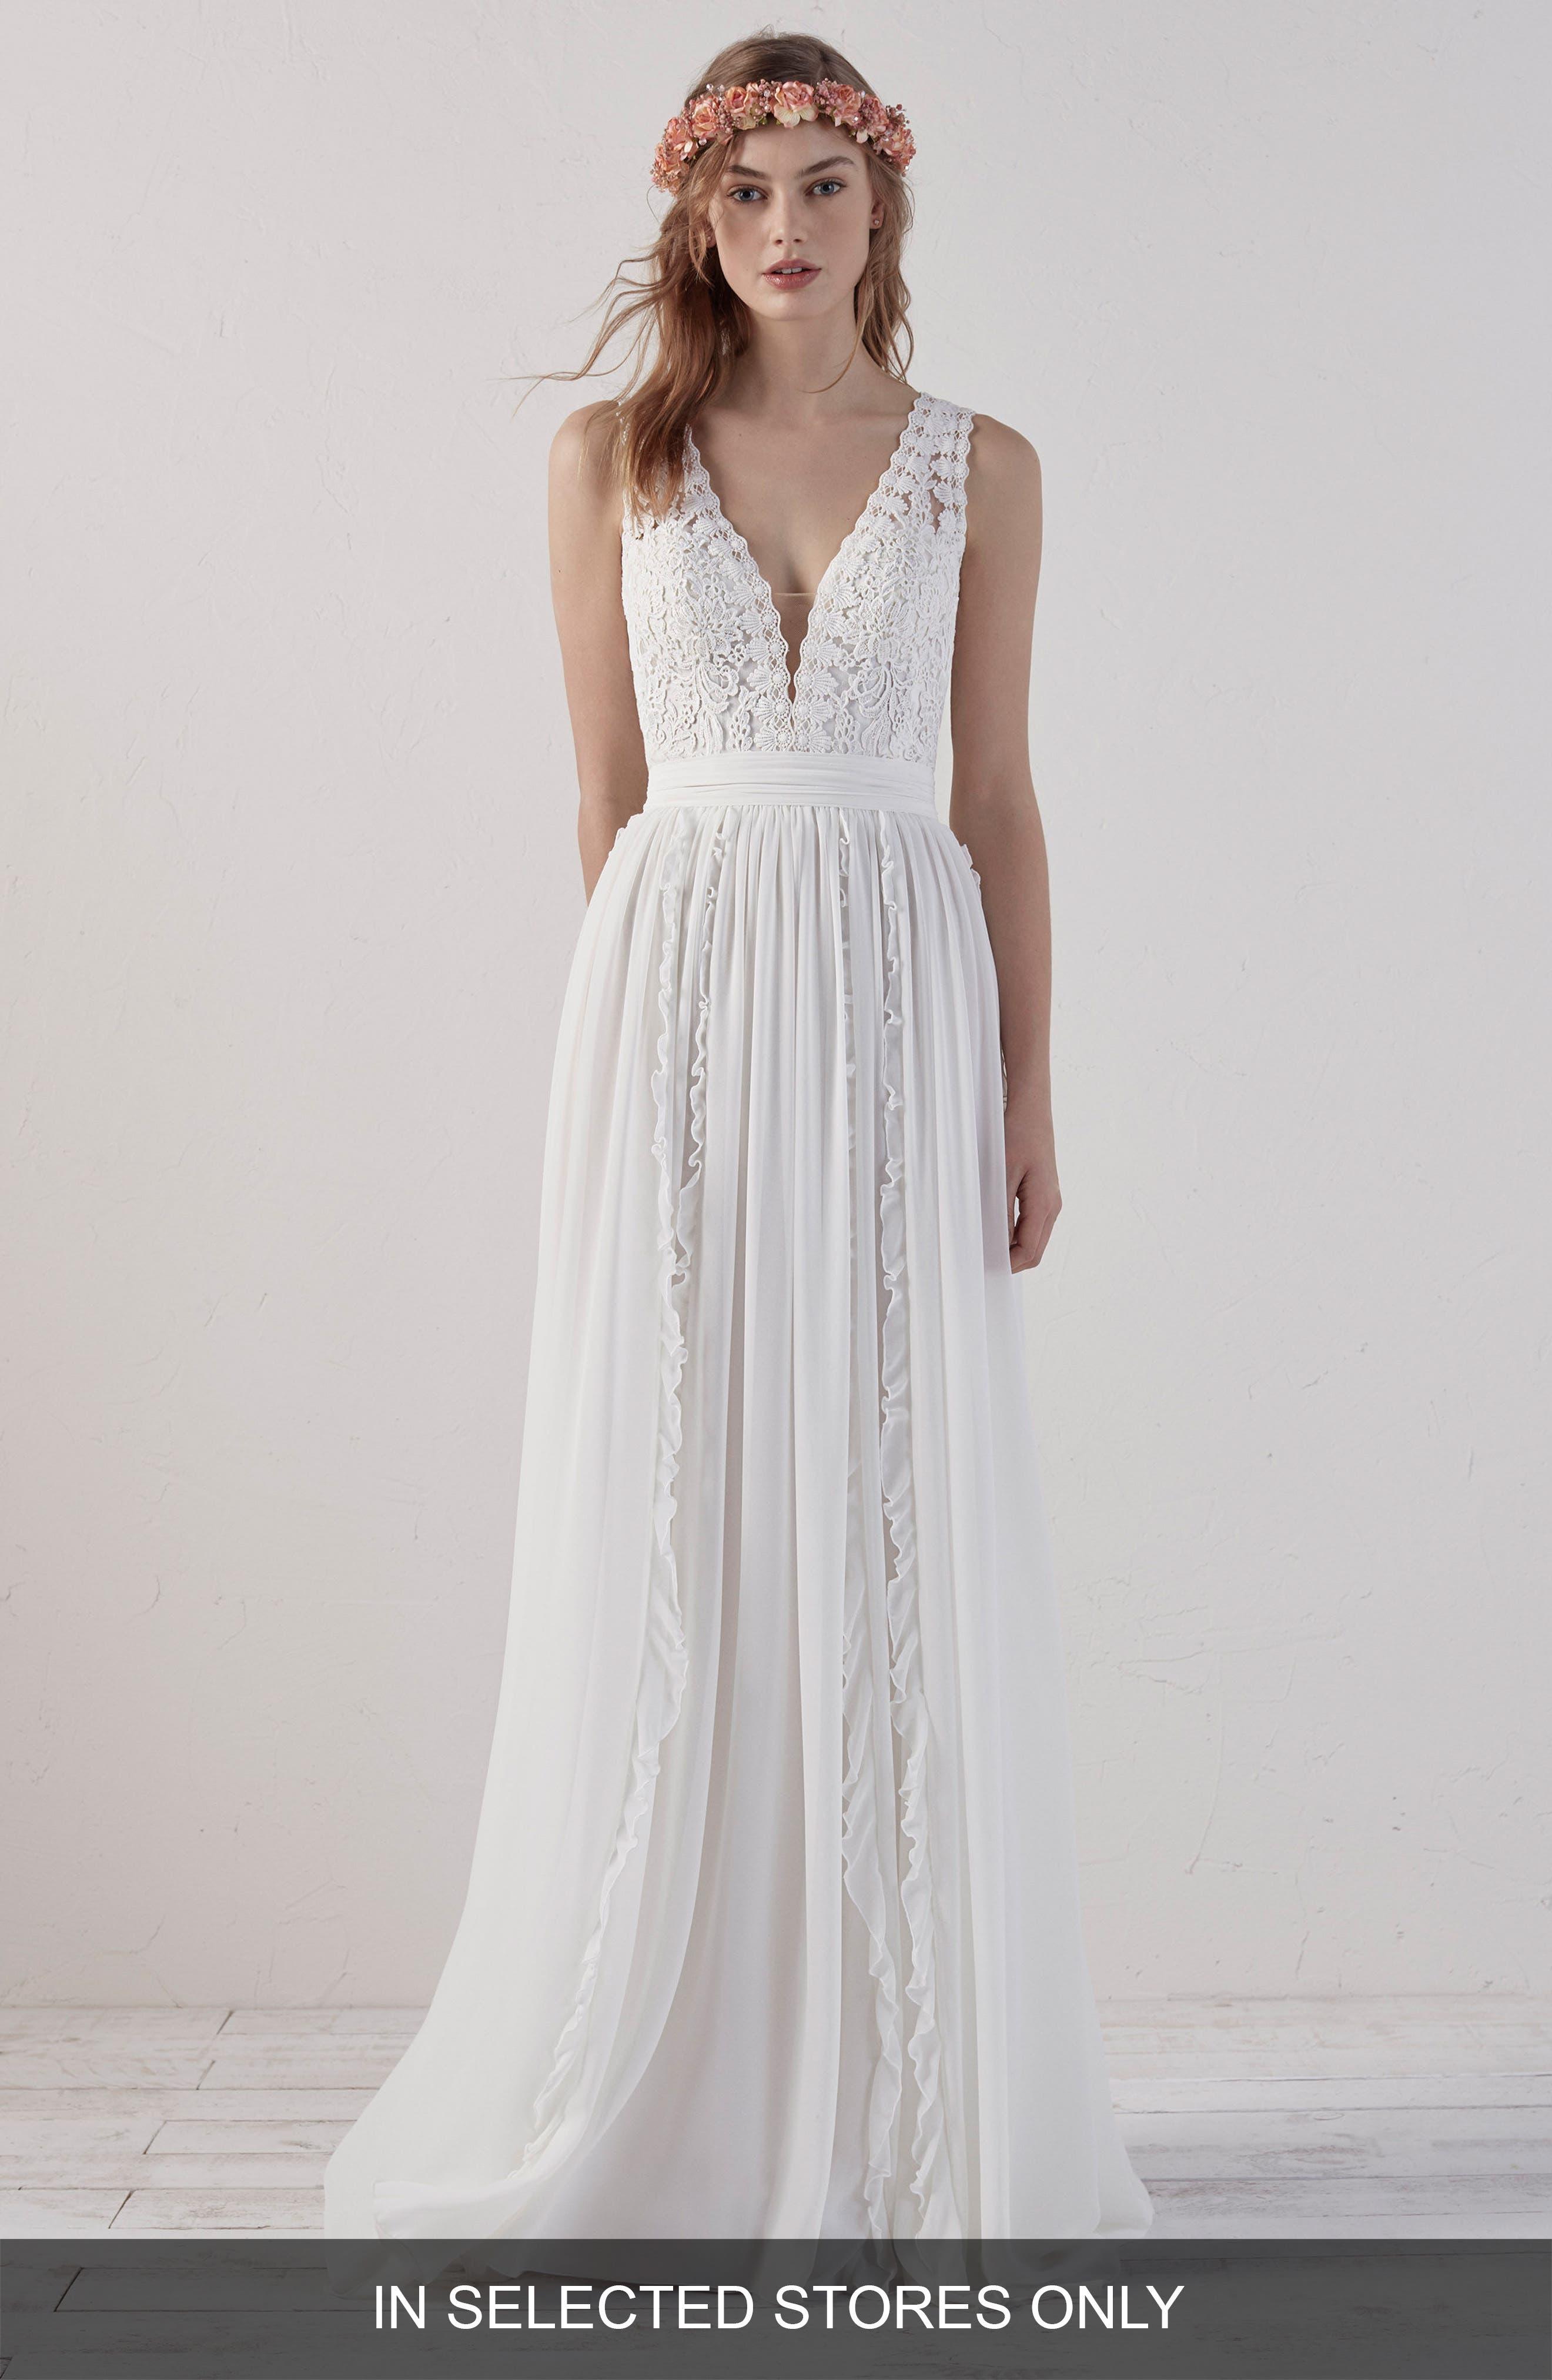 Elbet Boho V-Neck Lace & Chiffon Gown,                             Main thumbnail 1, color,                             OFF WHITE